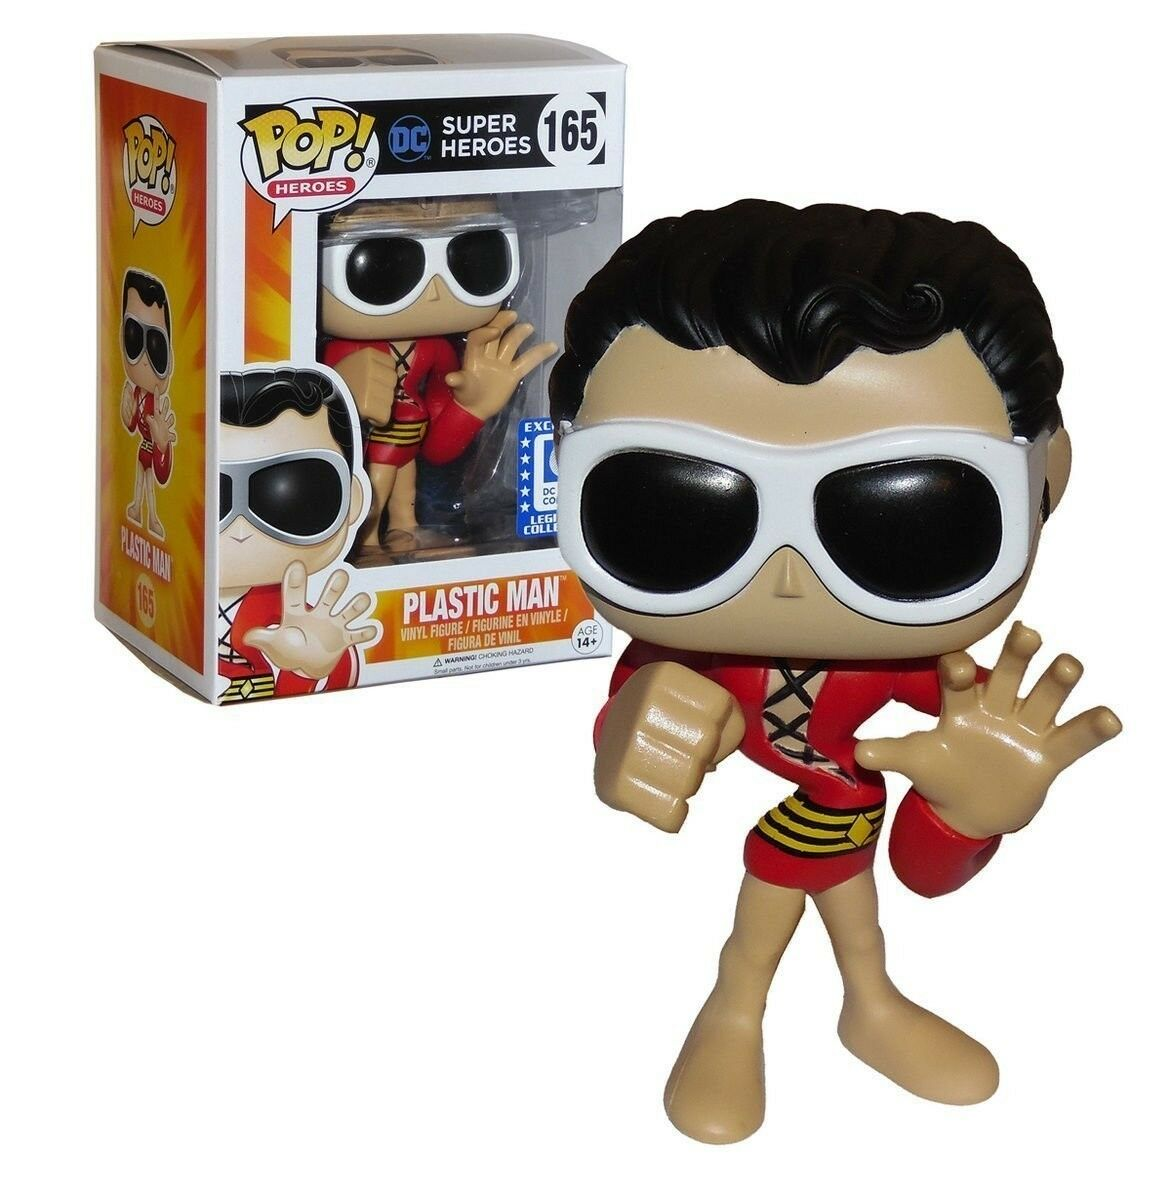 FUNKO POP HEROES DC SUPER HEROES  165 PLASTIC MANDC LOC EXCLUSIVE VINYL